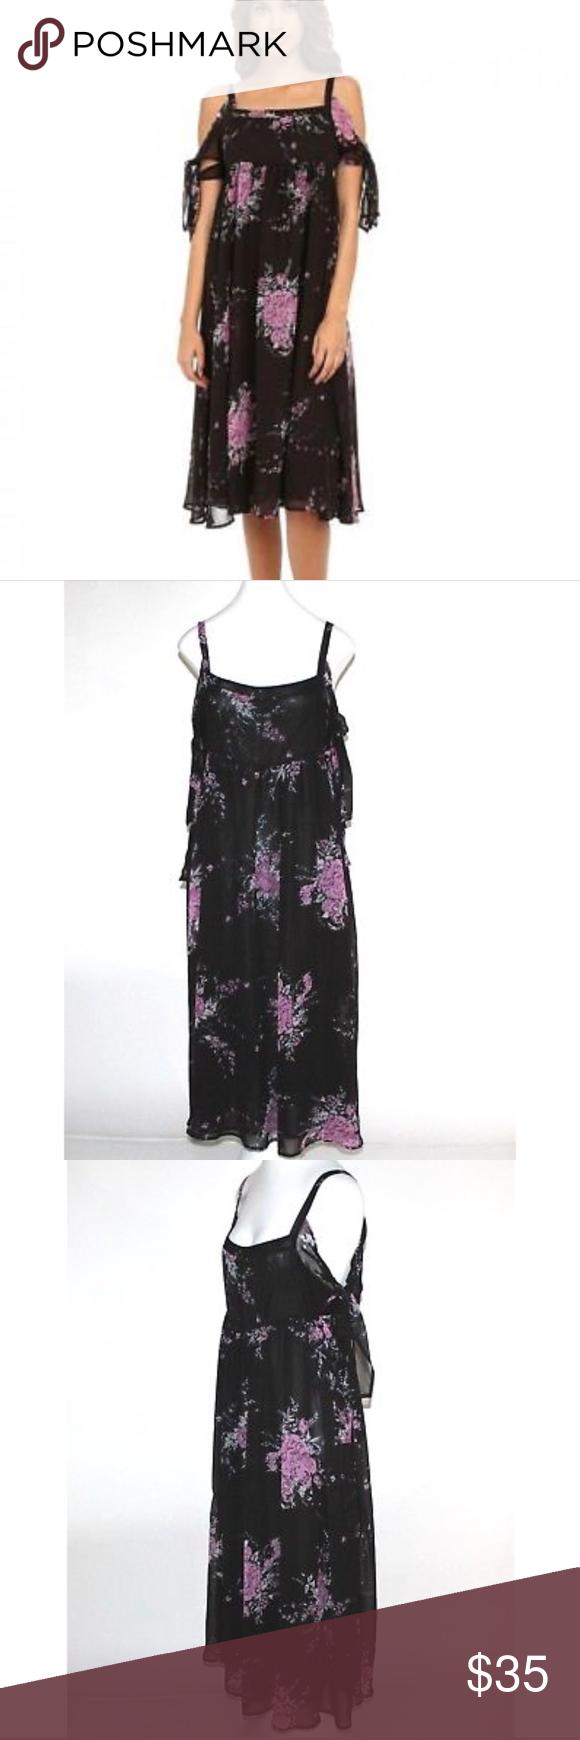 ebe1c325660  Free People   Tied to You  Floral Midi Dress Wispy